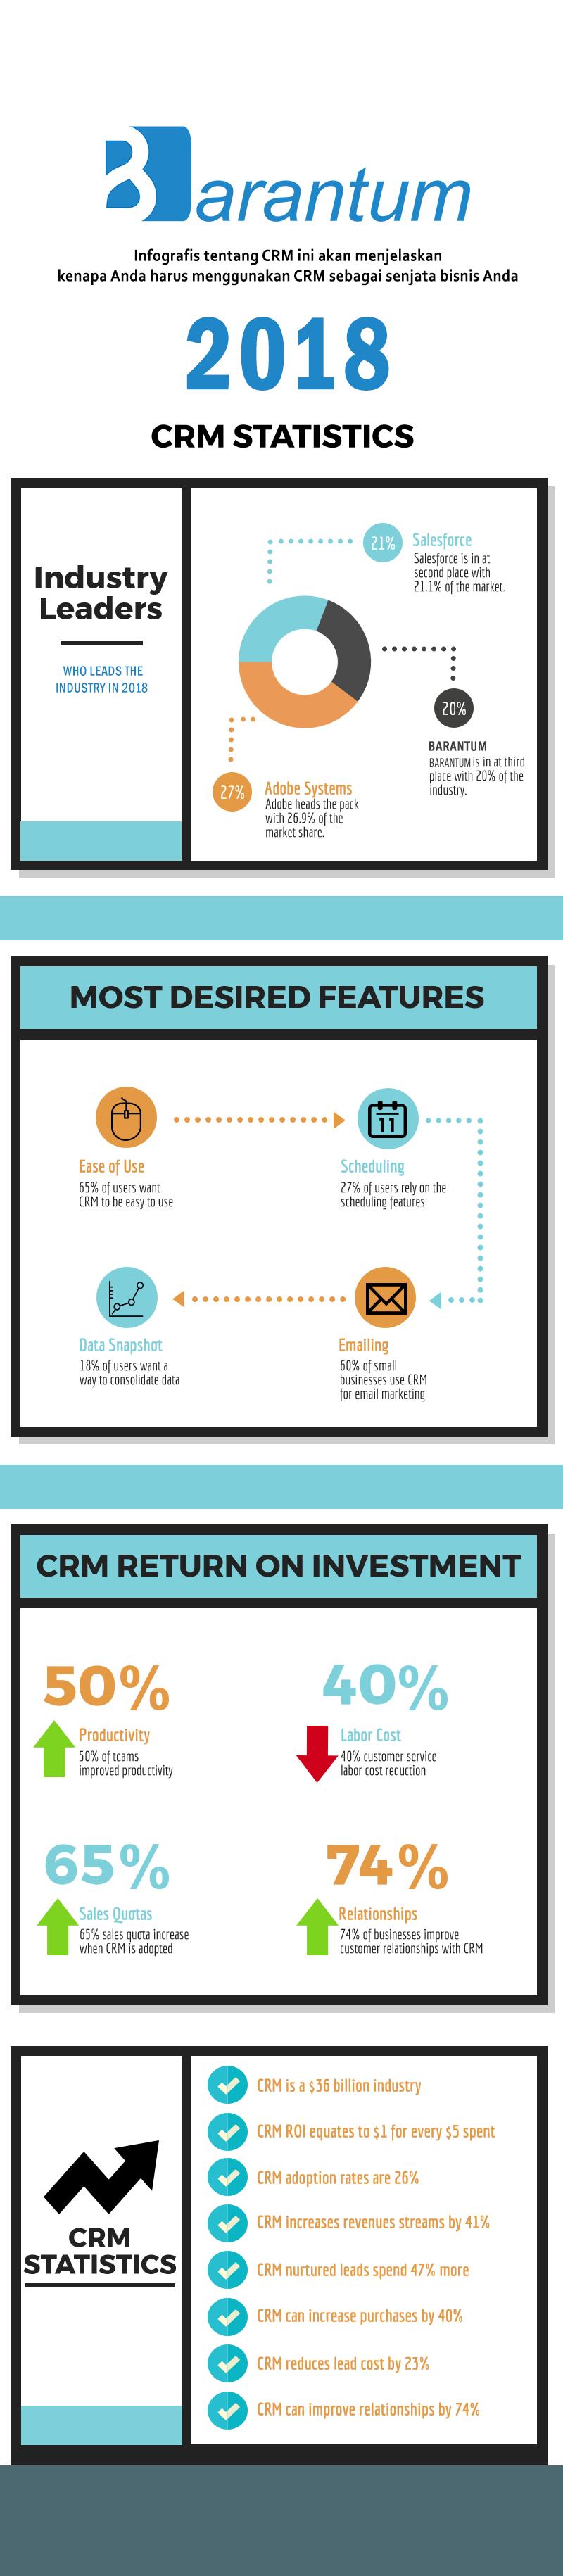 Infografis CRM Barantum